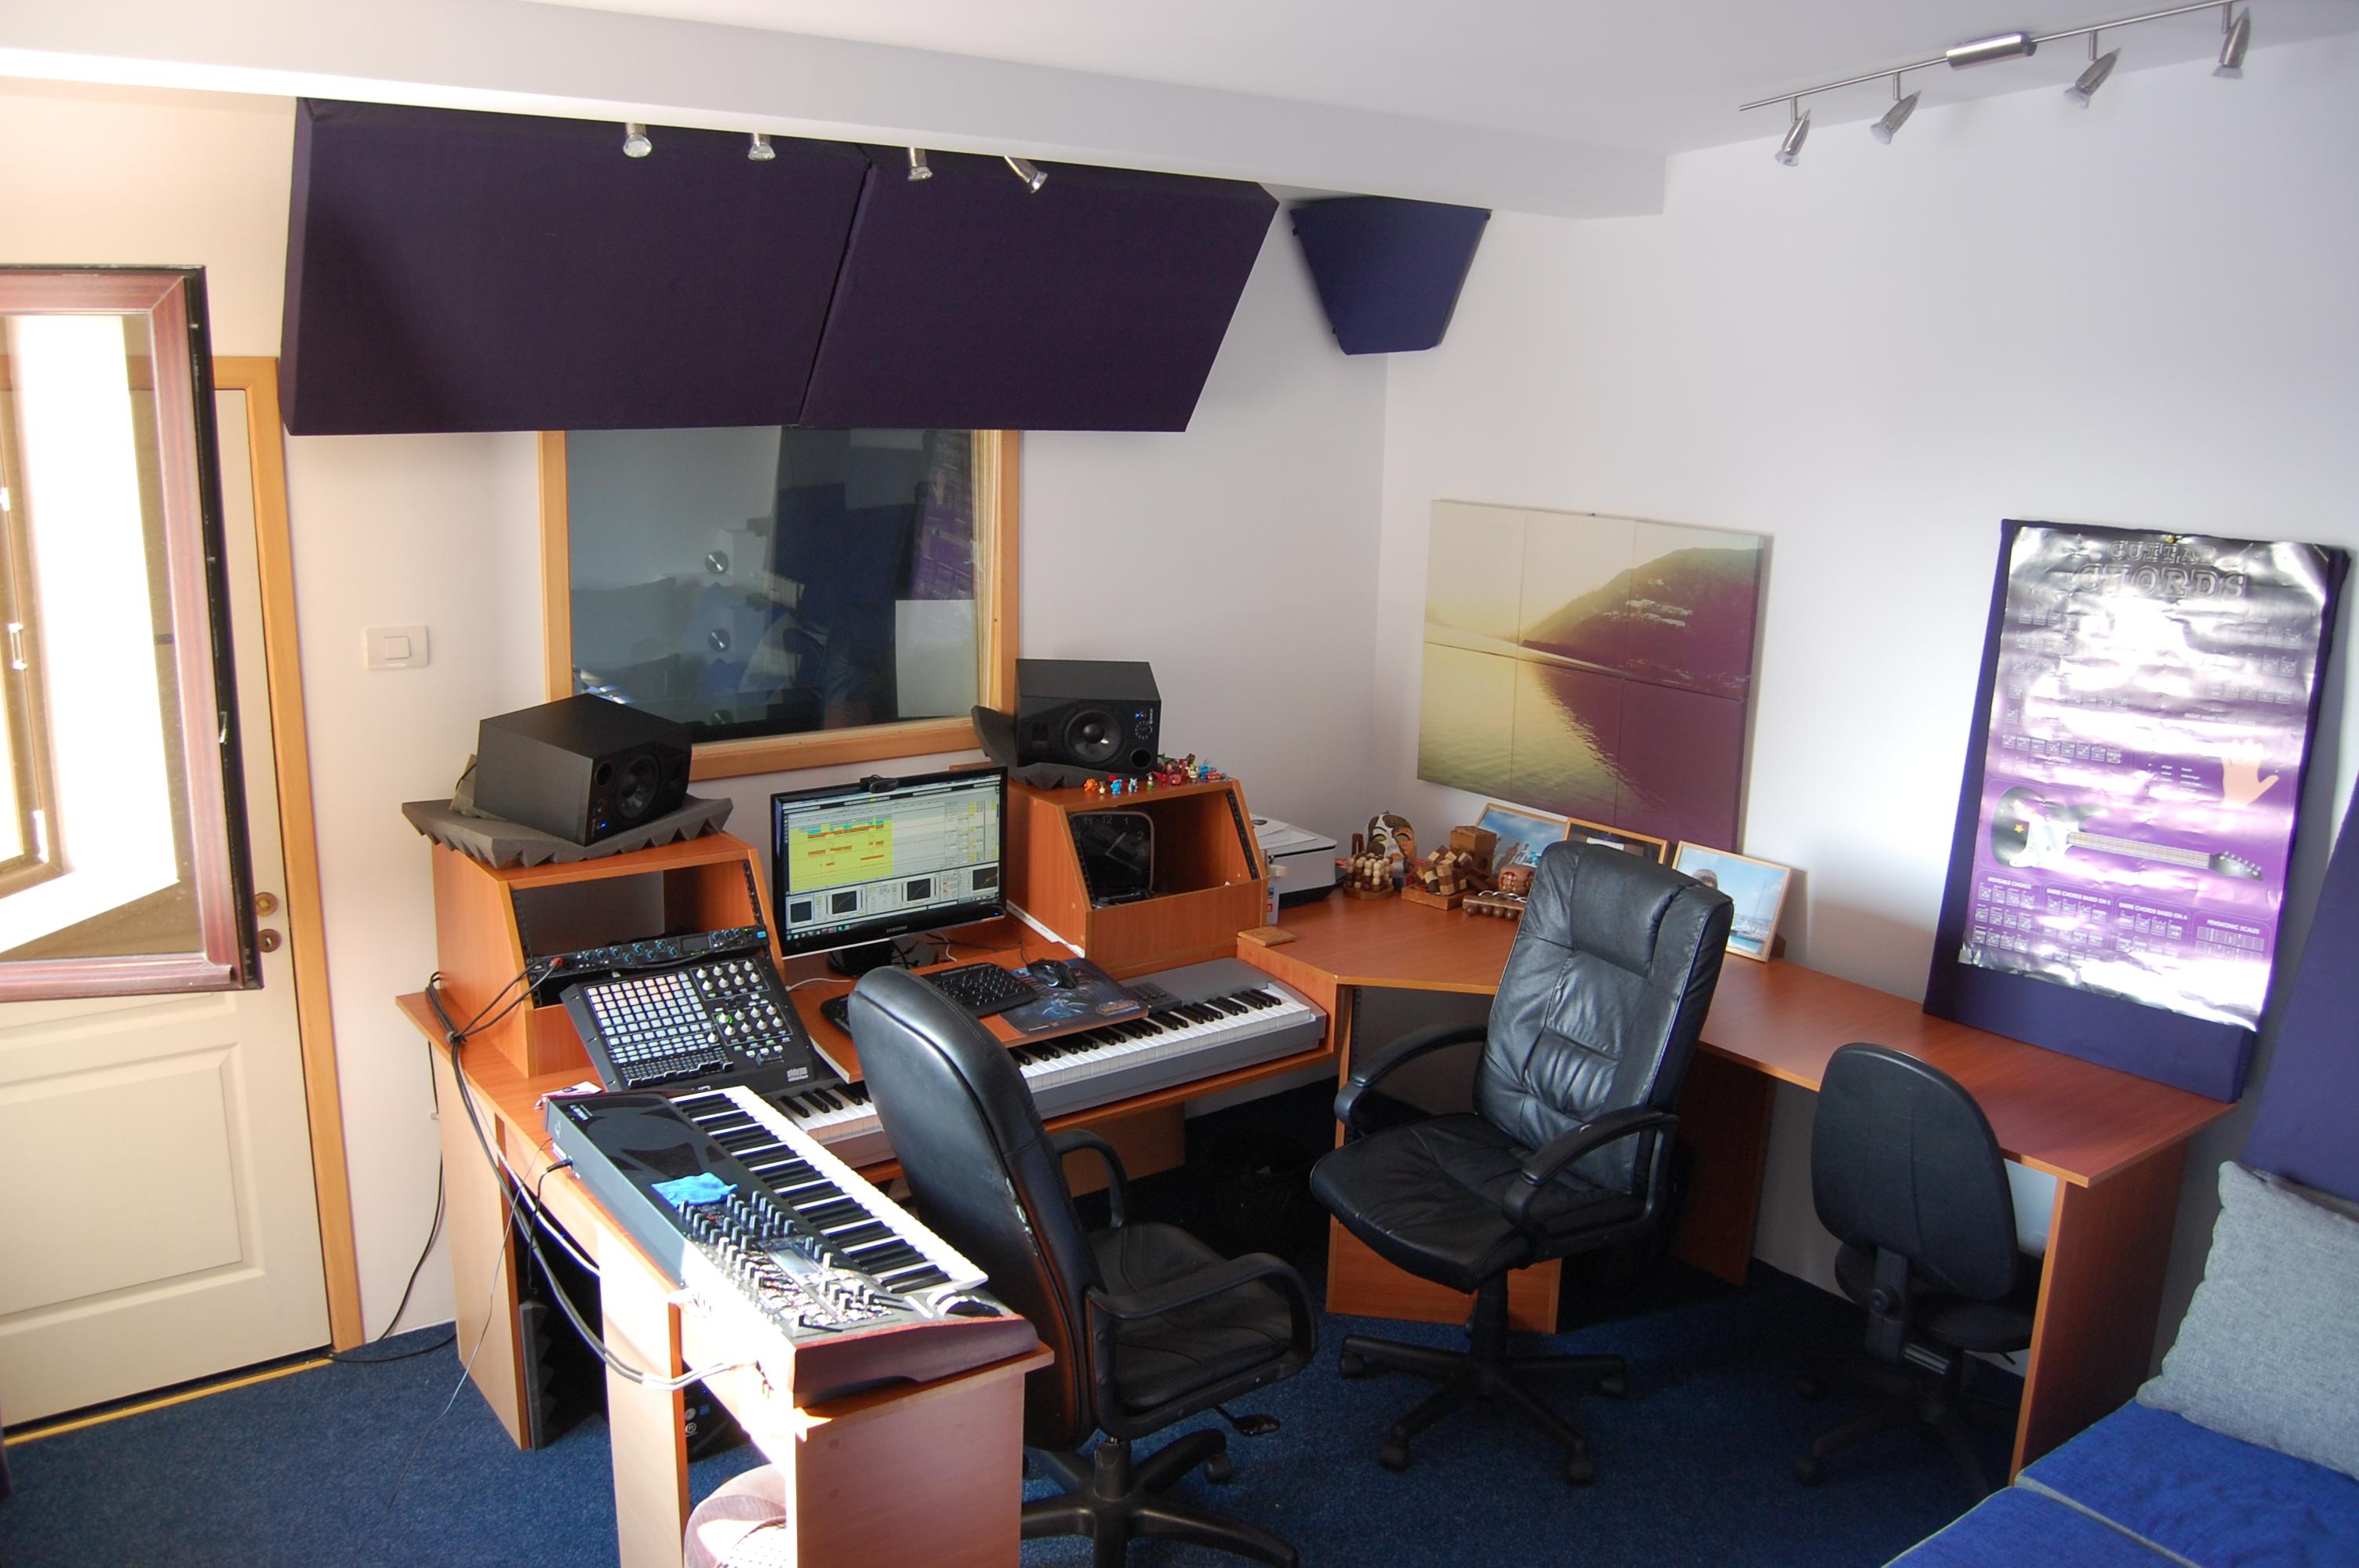 garage recording studio design car garage plans 1000 ideas about recording studio design on pinterest